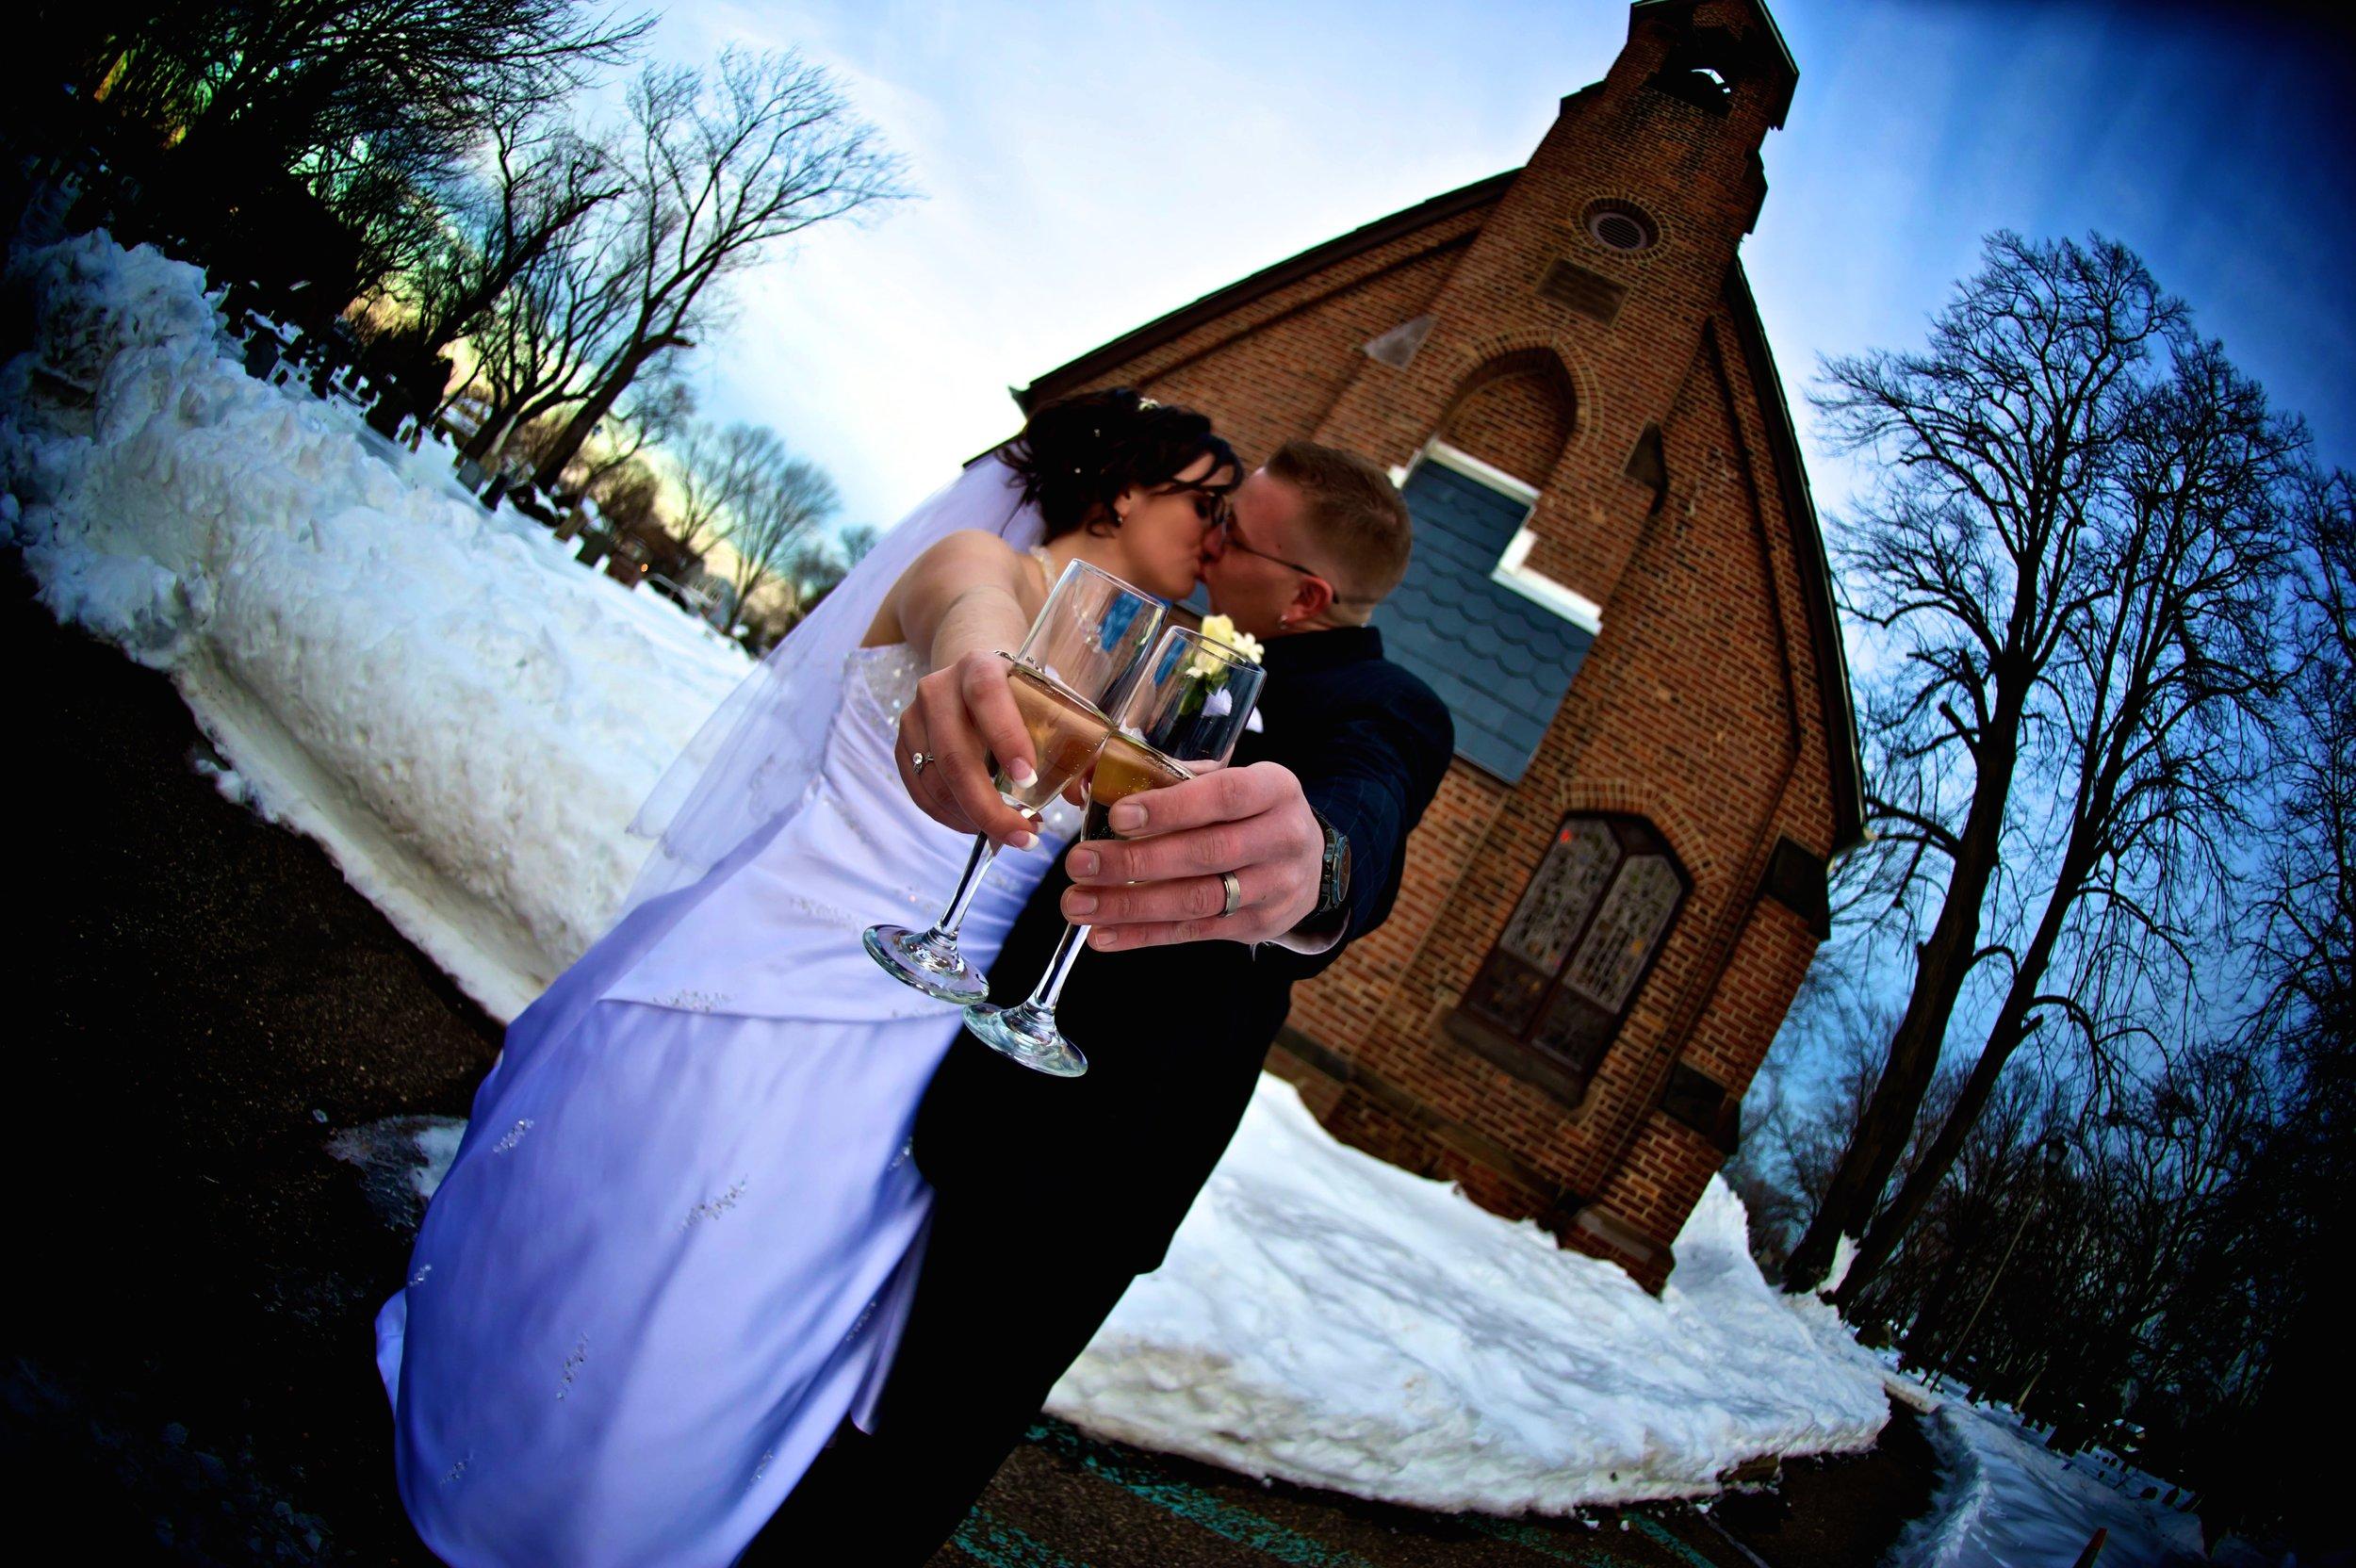 theAcelebs Wedding Images 615.jpg